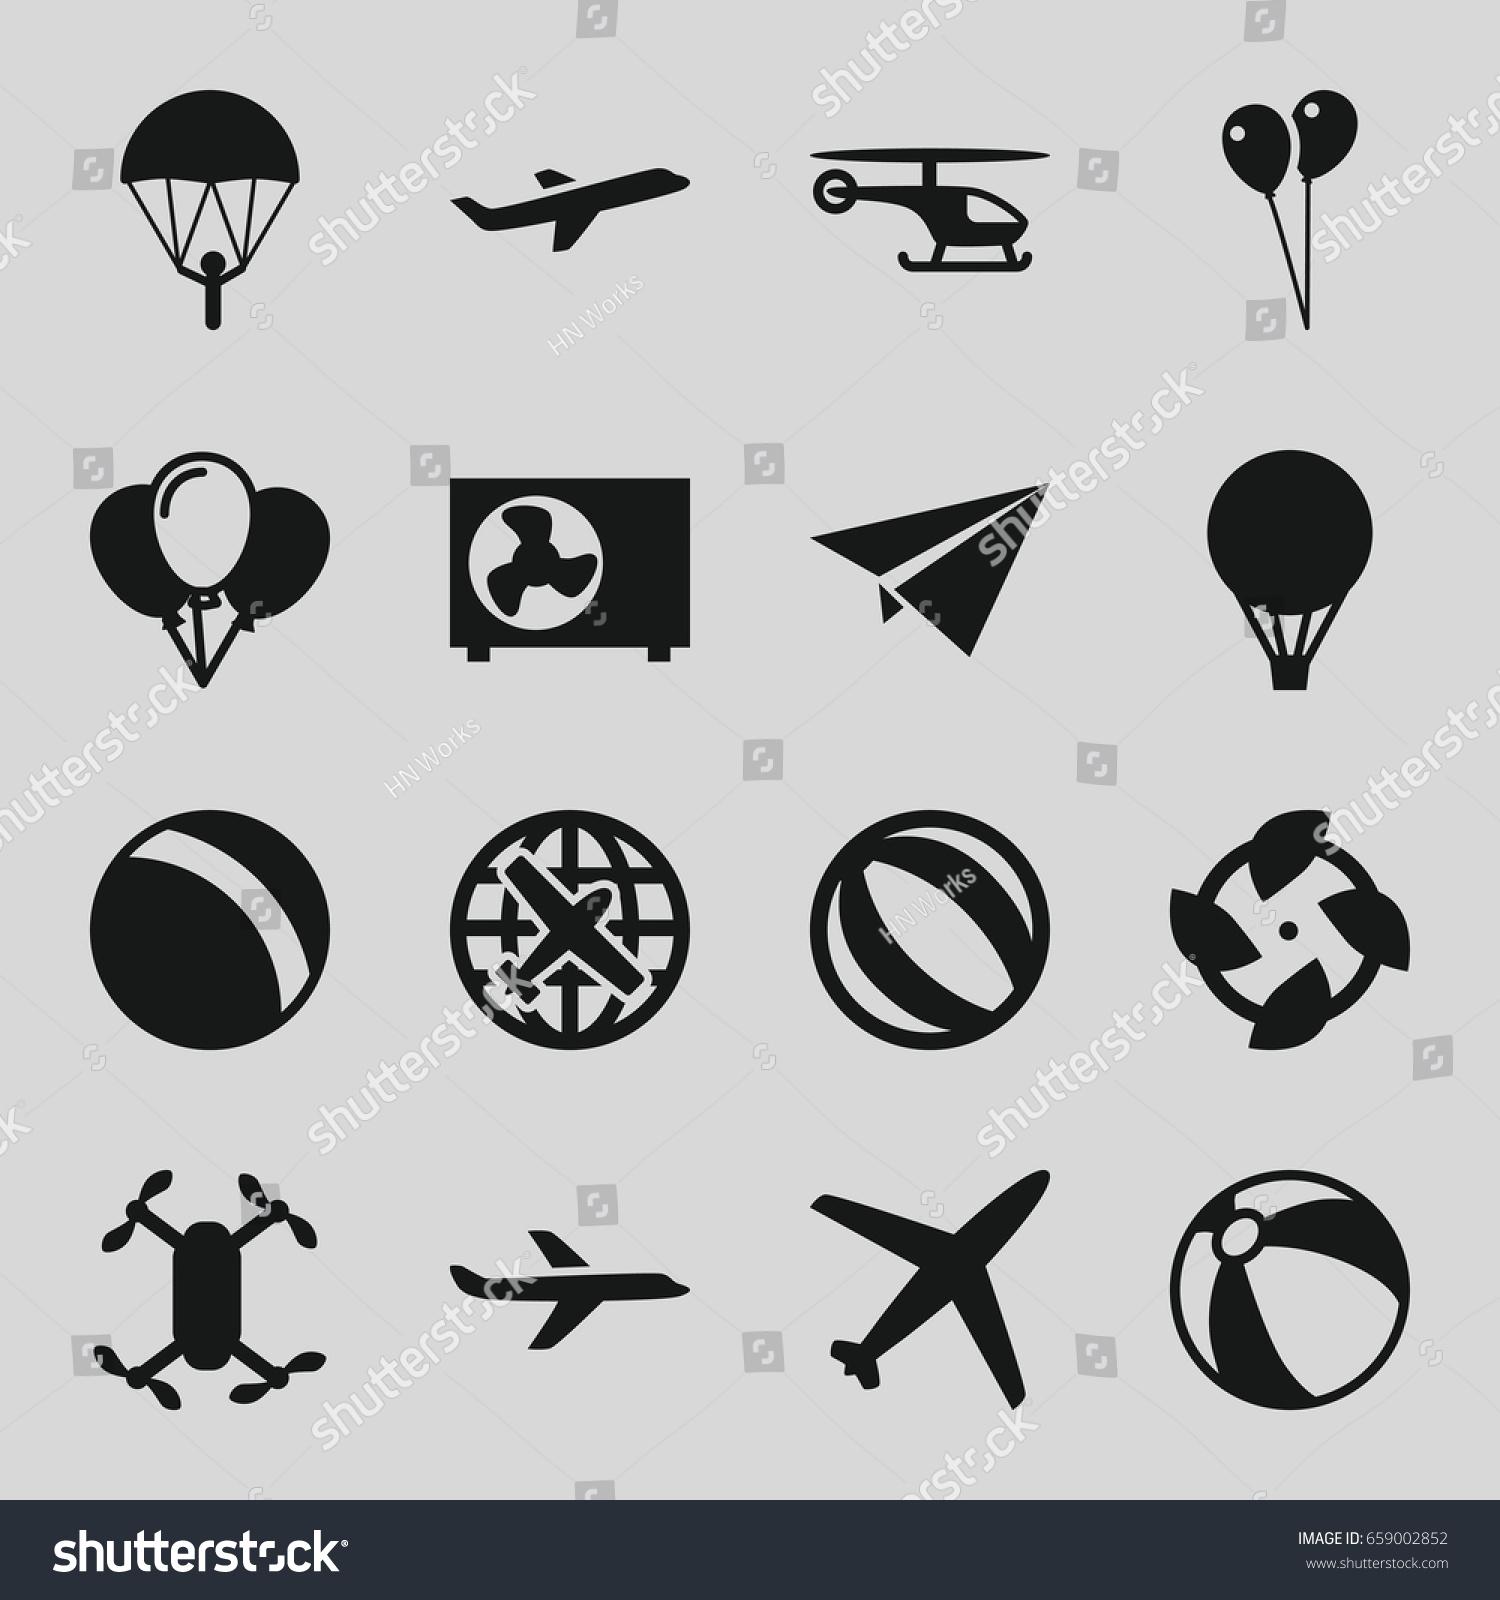 air icons set set 16 air เวกเตอร สต อก 659002852 shutterstock